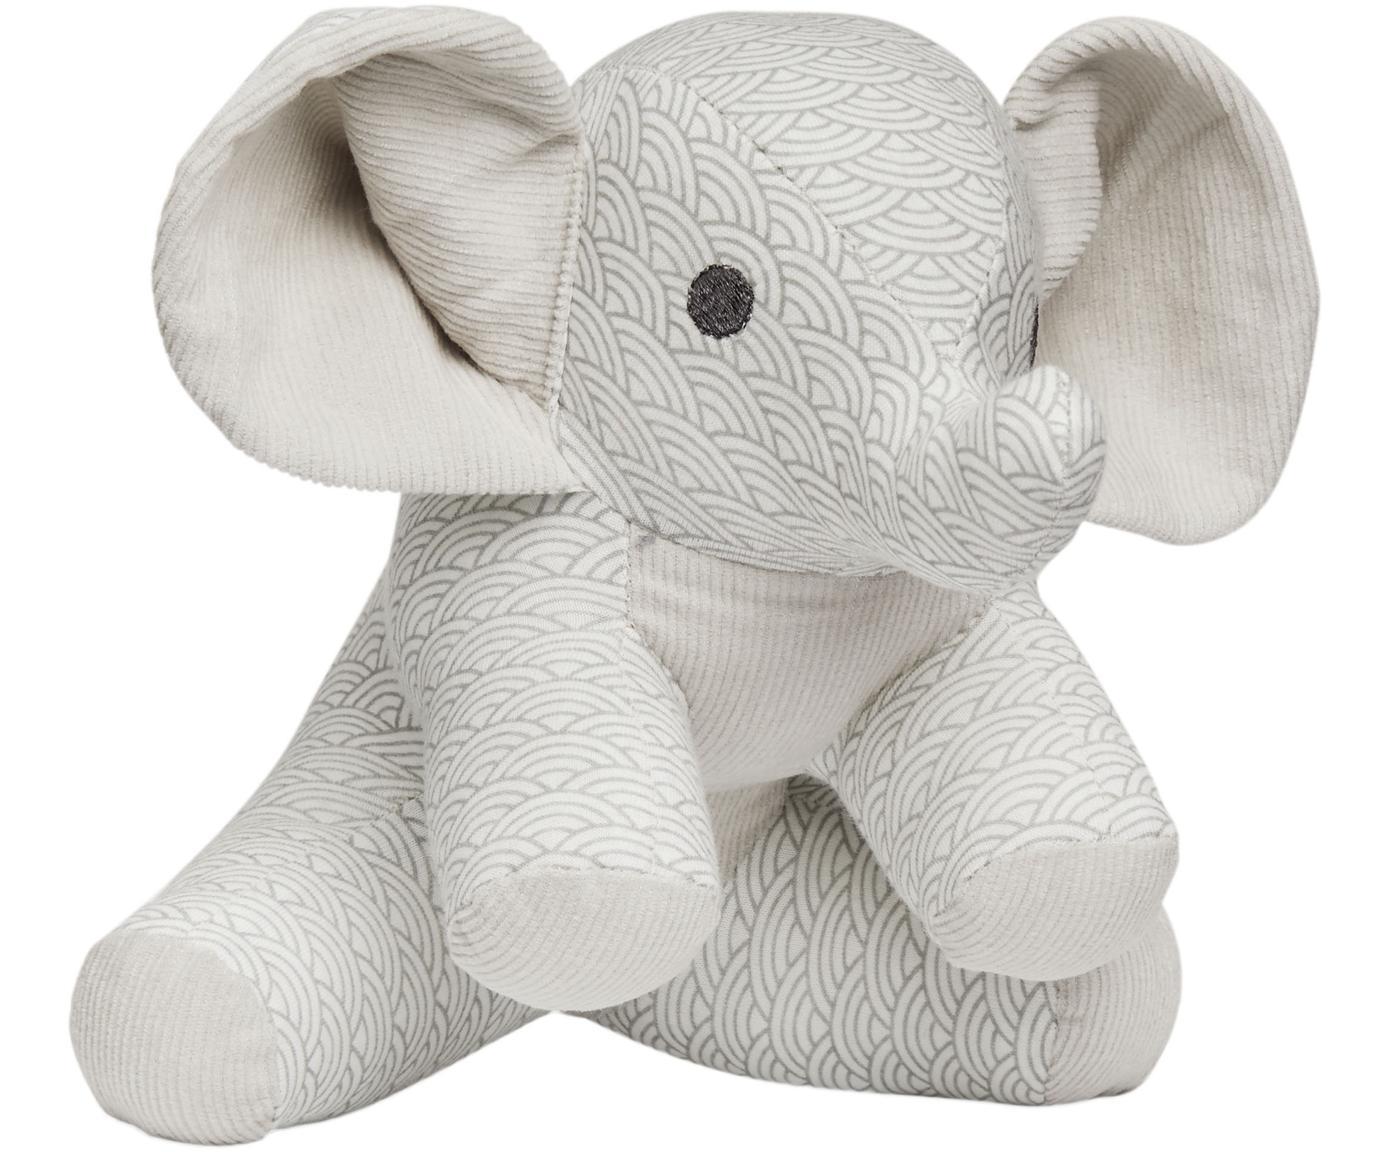 Peluche elefante in cotone organico Elephant, Rivestimento: cotone organico, Grigio, bianco, grigio chiaro, Larg. 20 x Alt. 21 cm